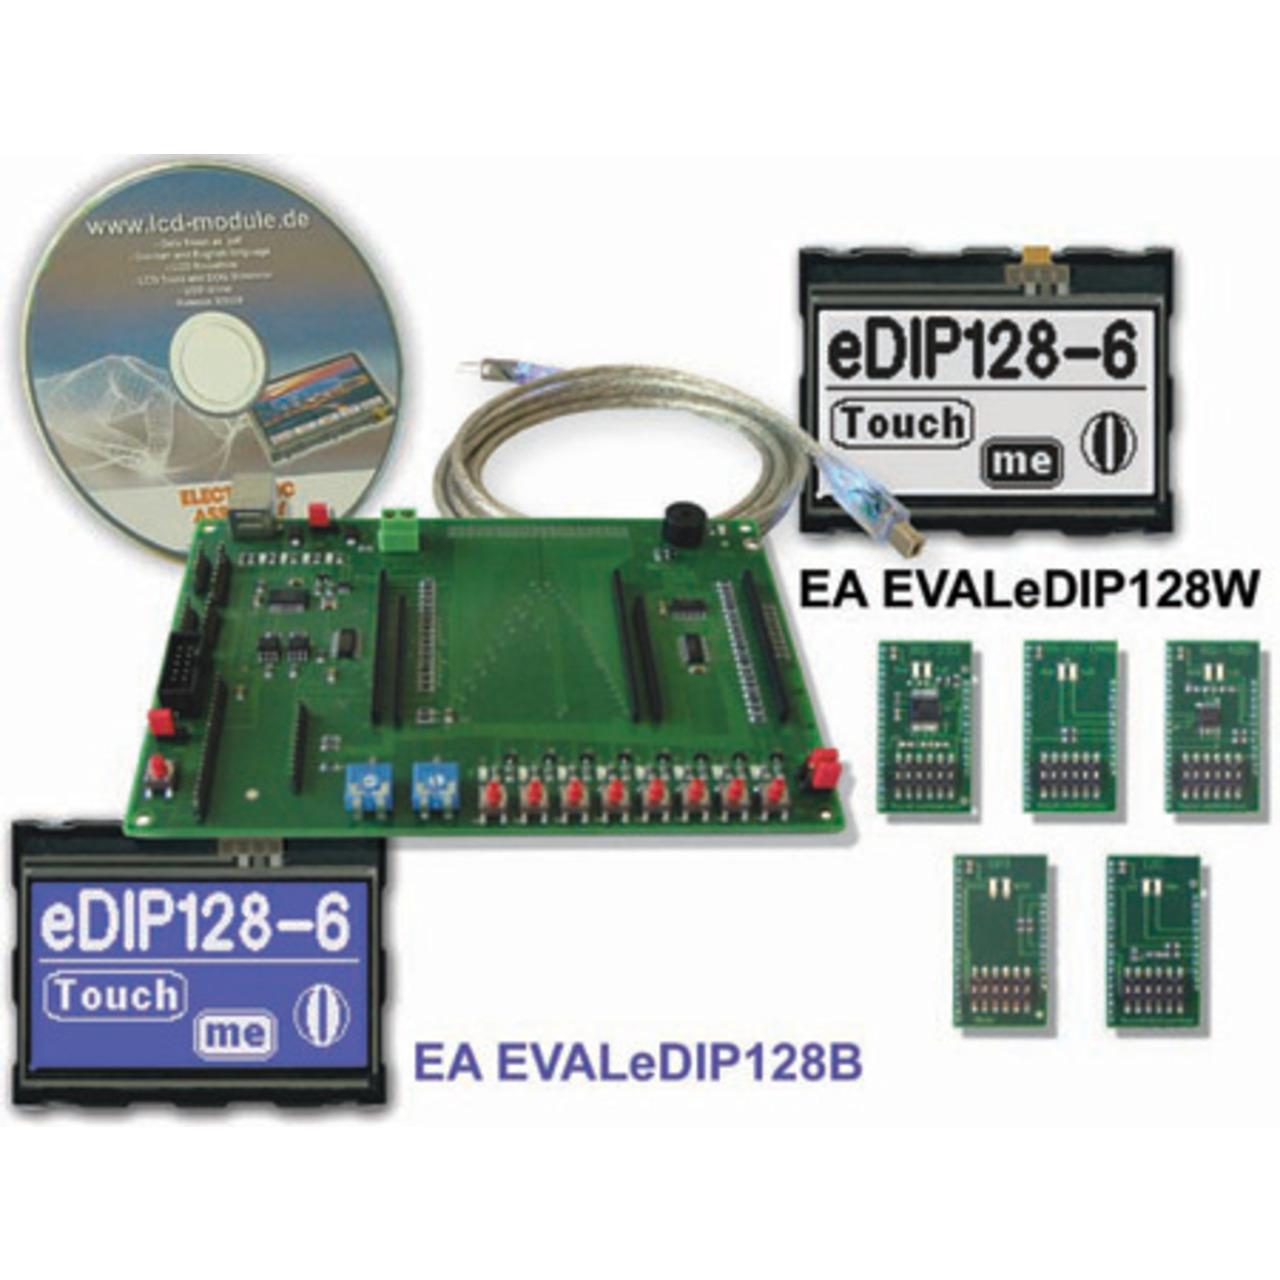 Electronic Assembly Starterkit mit Grafik-LCD EA EVALeDIP128B 128x64 Pixel